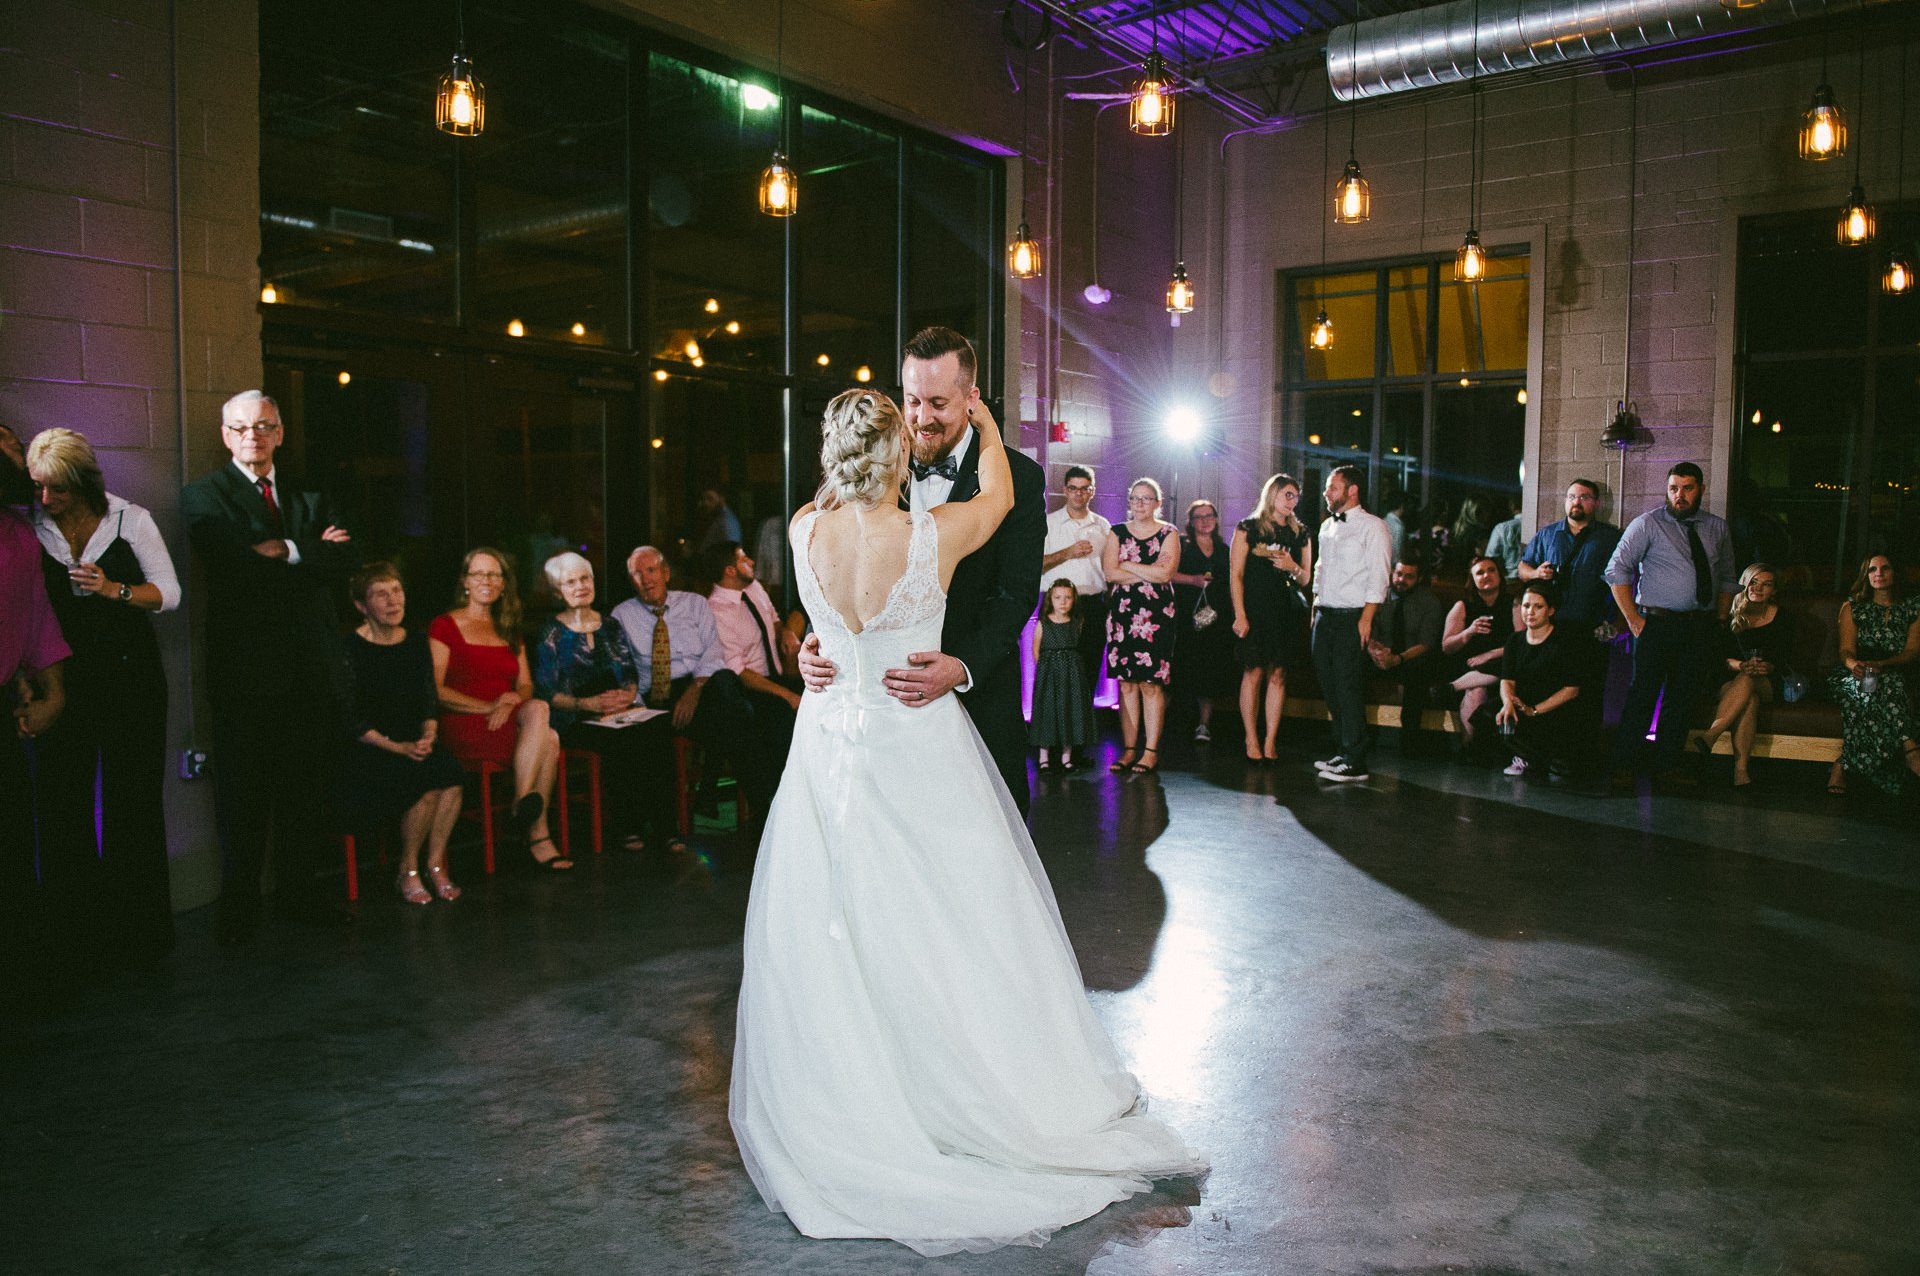 Goldhorn Brewery Wedding Photos in Cleveland 2 38.jpg